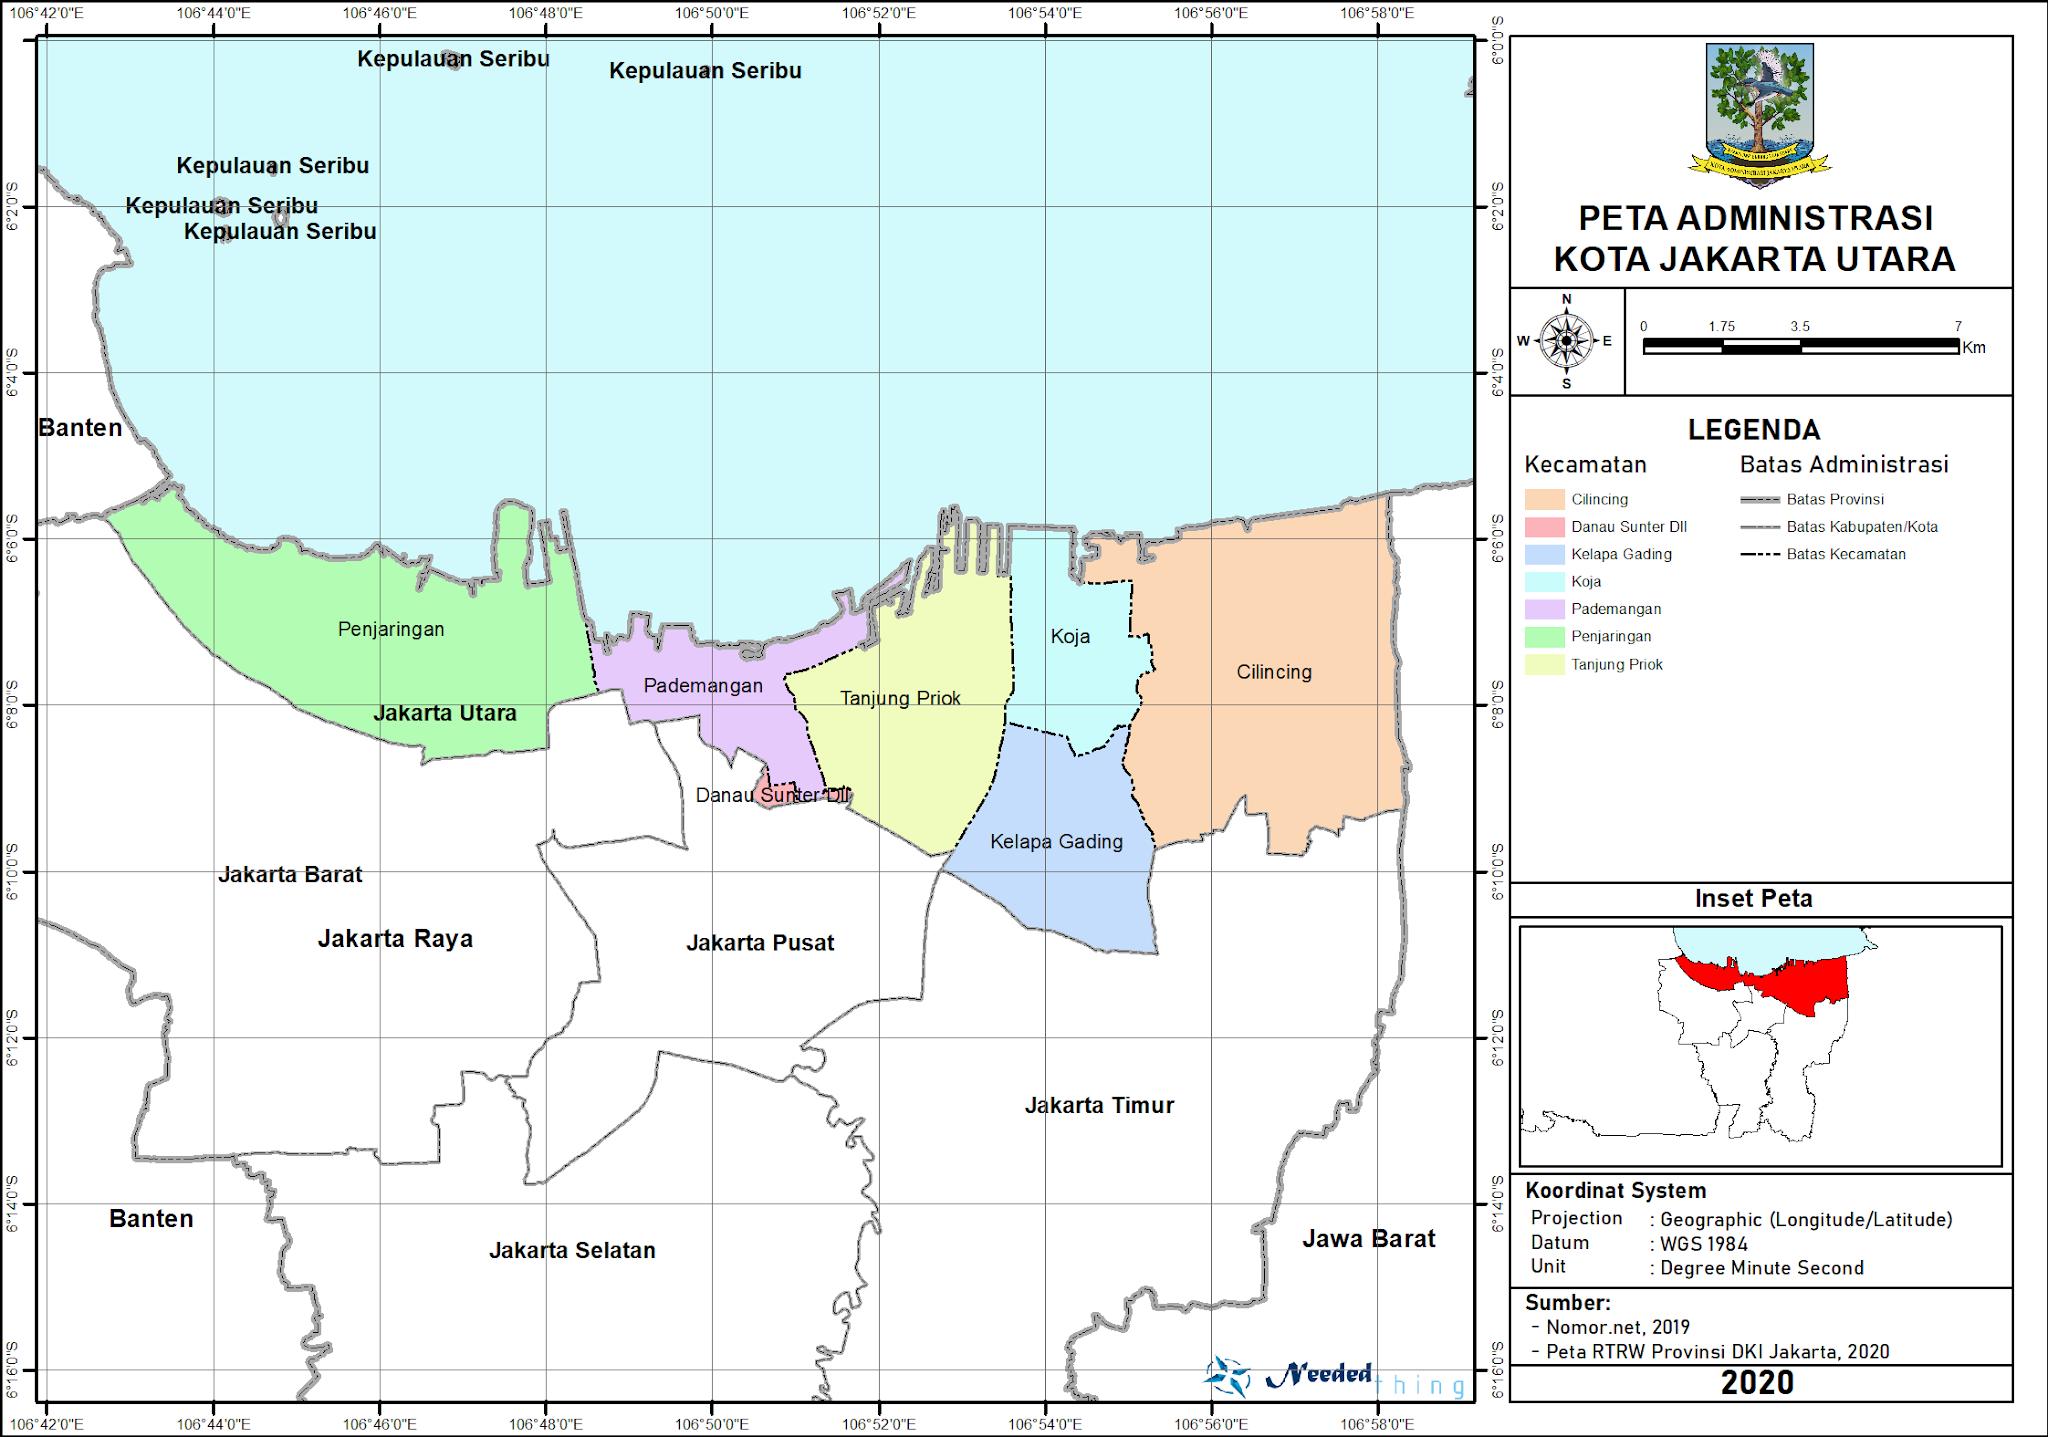 Peta Administrasi Kota Jakarta Utara, Provinsi DKI Jakarta ...